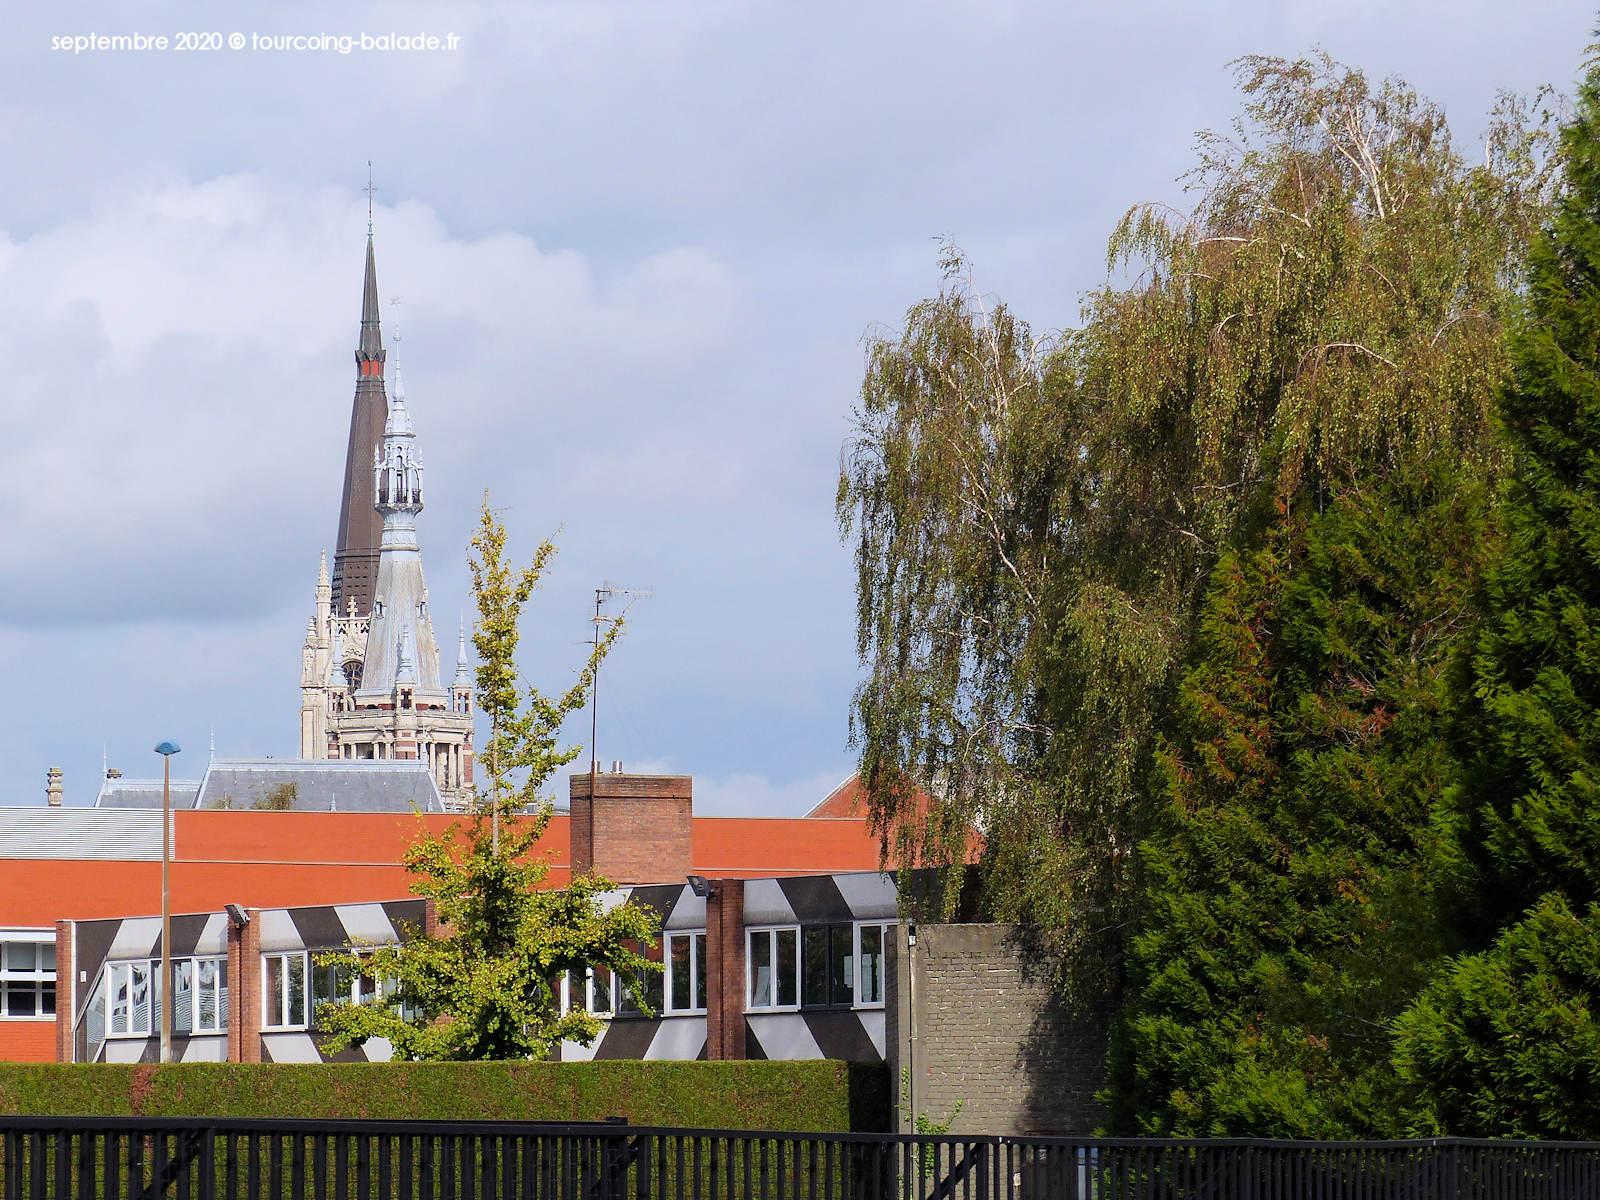 Beffroi et église Saint Christophe, Tourcoing 2020